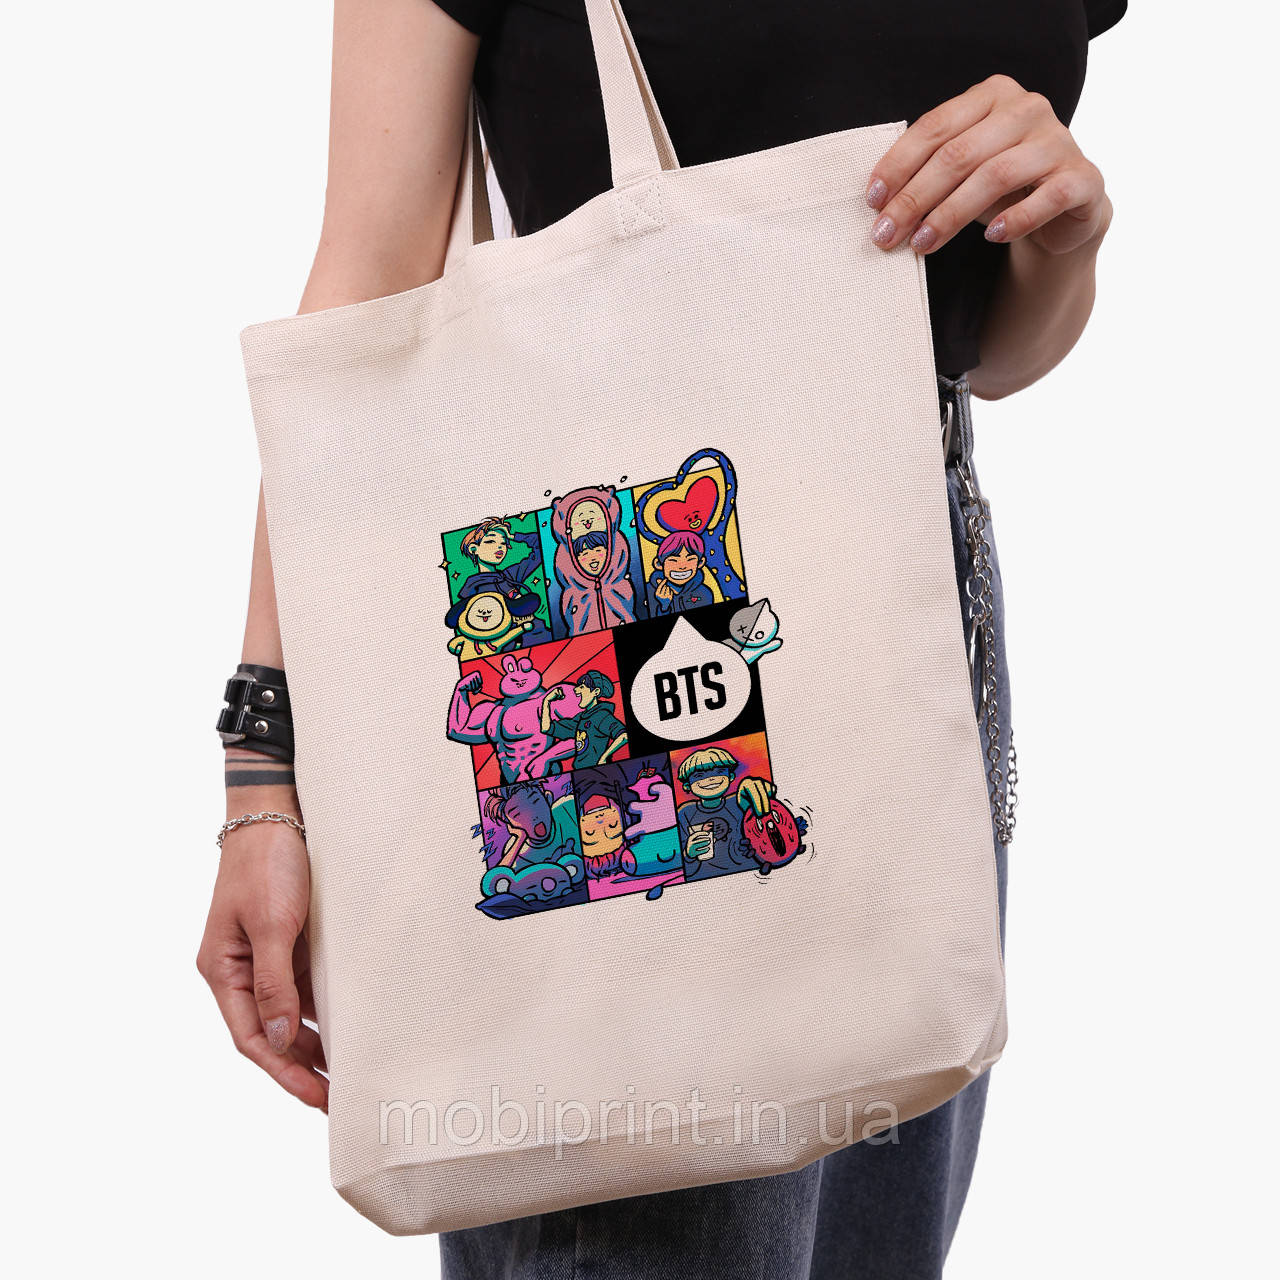 Эко сумка шоппер белая БТС (BTS) (9227-1078-1)  экосумка шопер 41*39*8 см